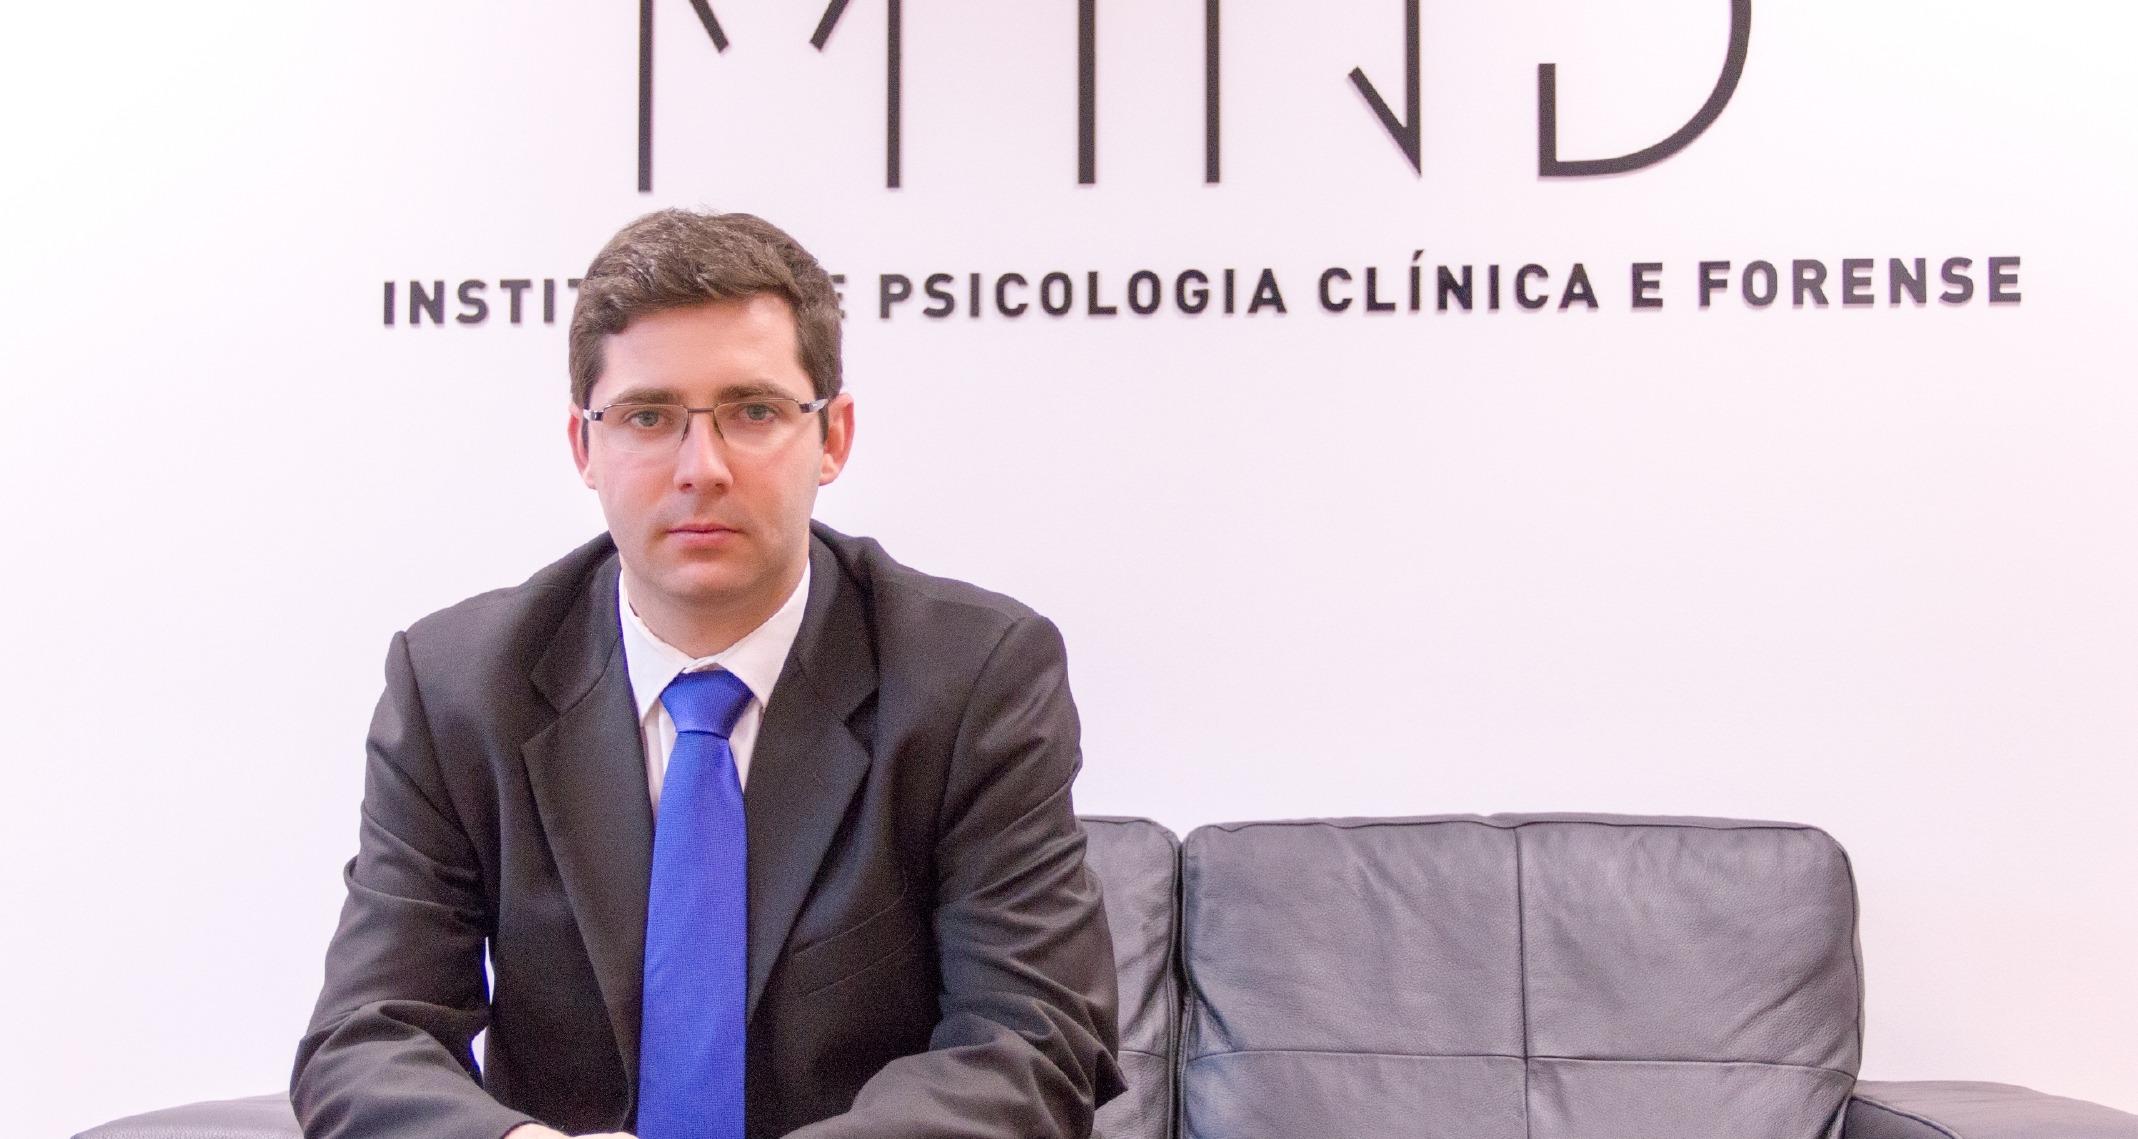 Mauro Paulino | Psicólogo Clínico e Forense